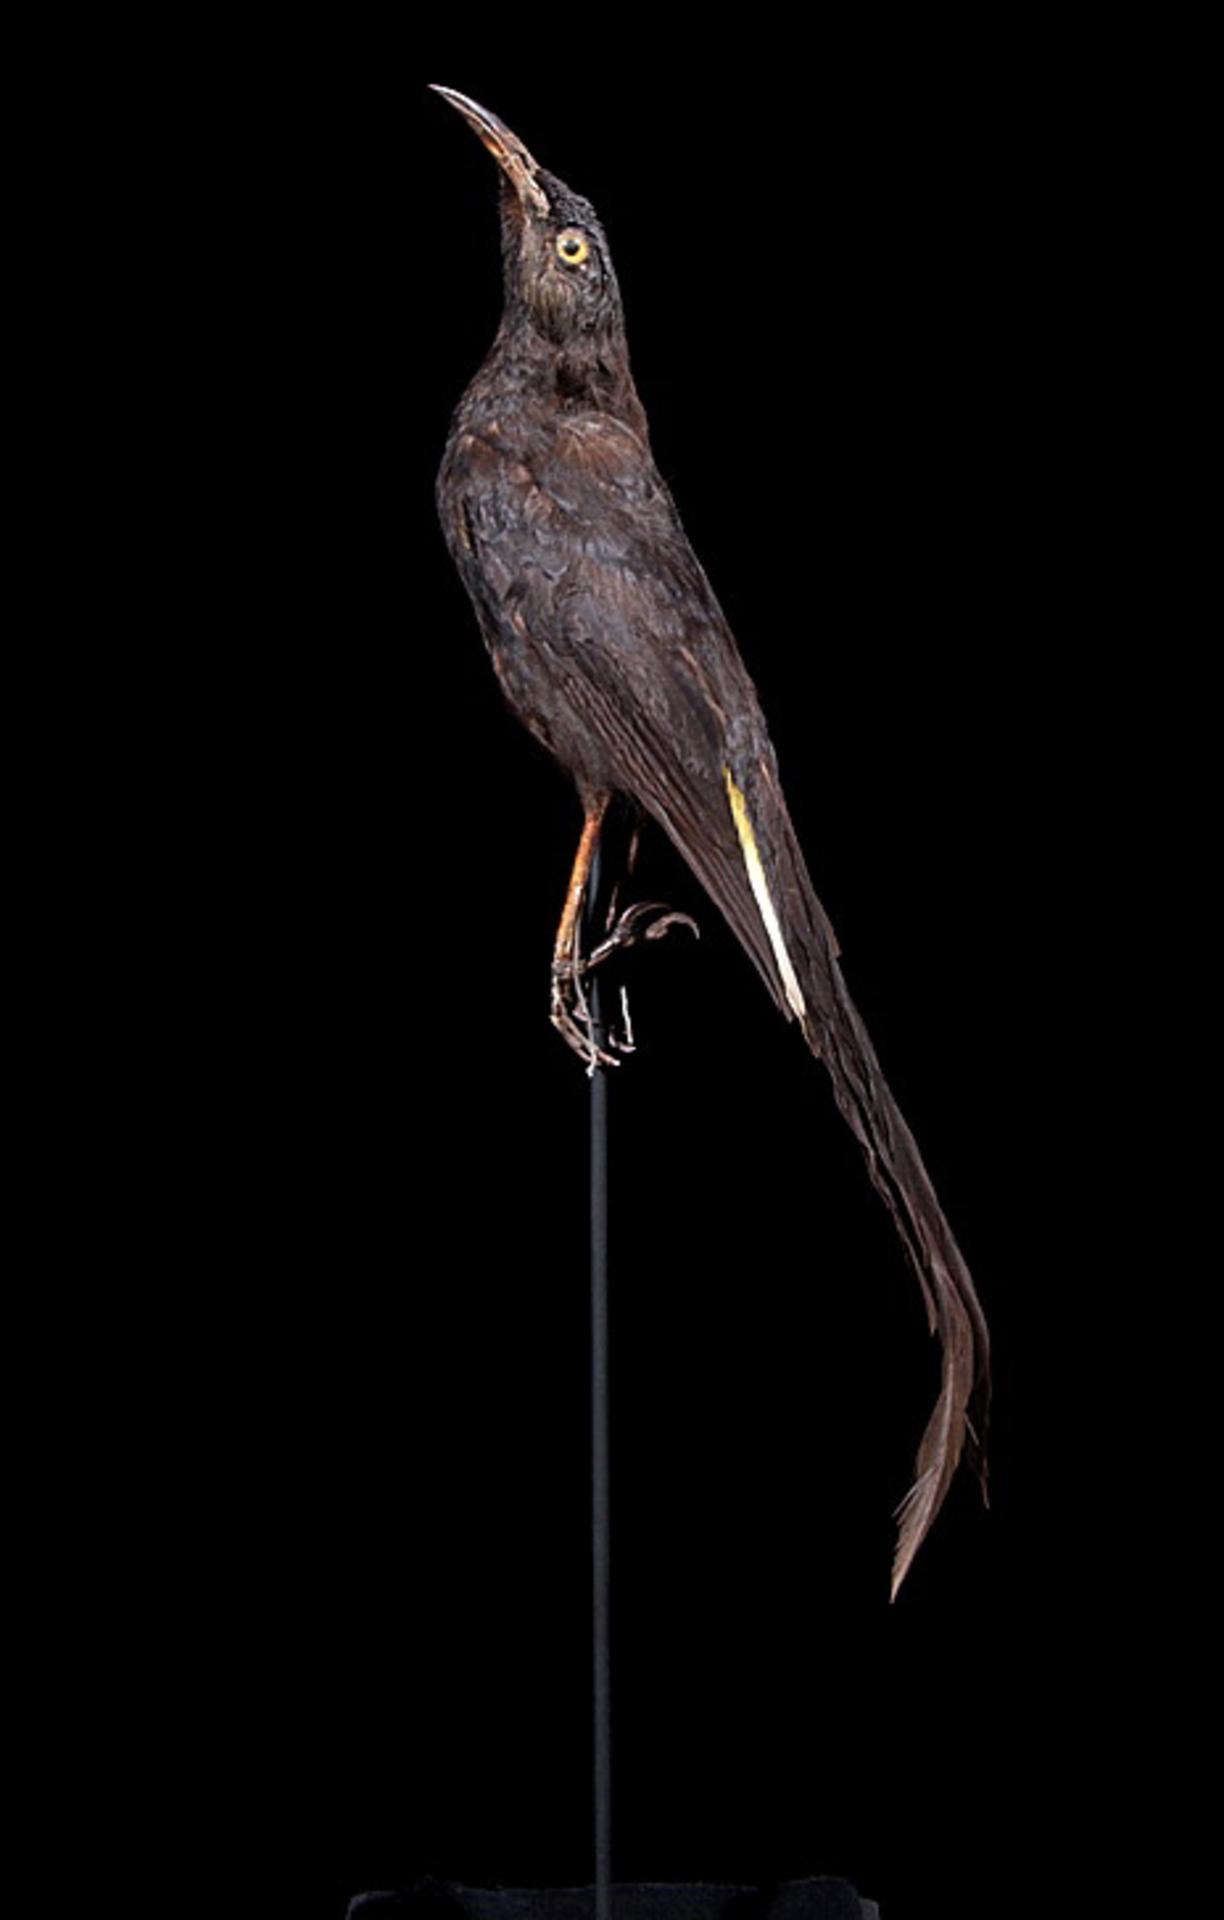 RMNH.AVES.110044 | Moho nobilis (Merrem, 1786)